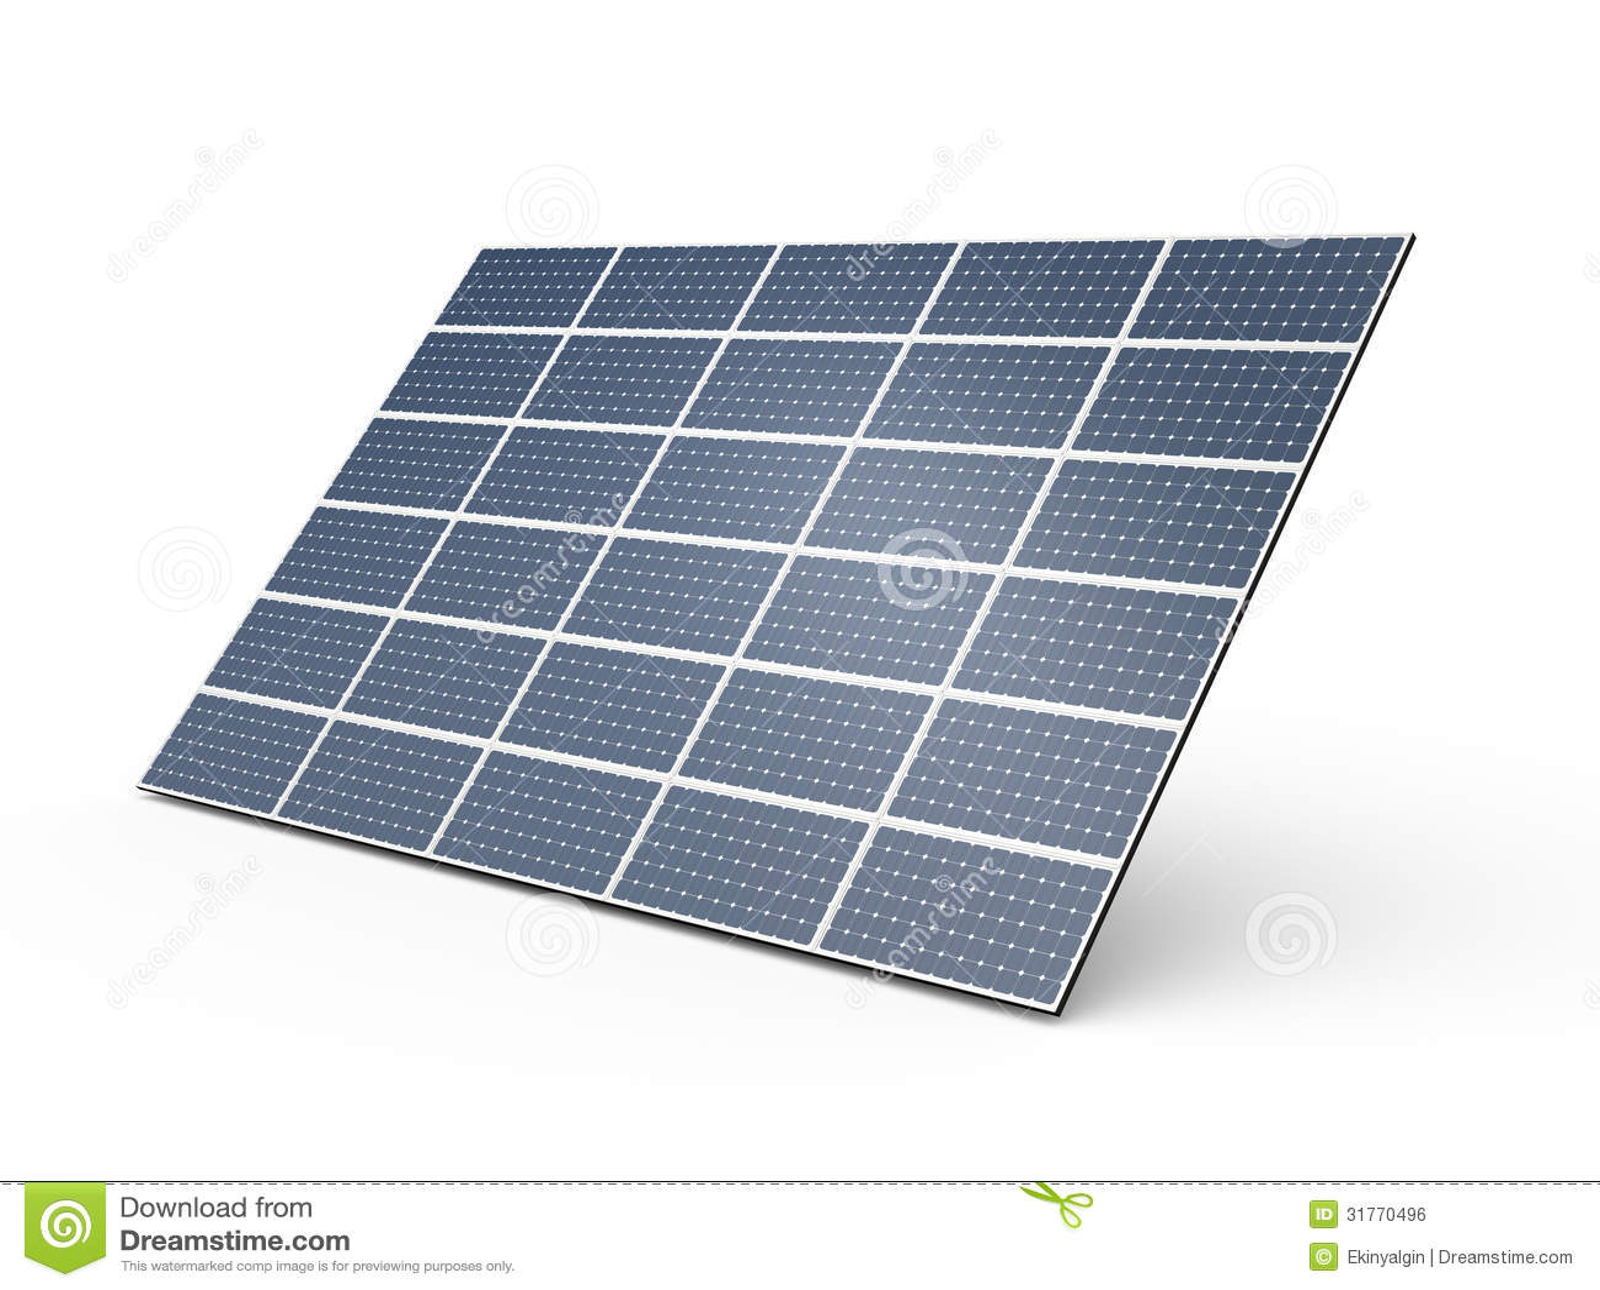 solar panel background - photo #45